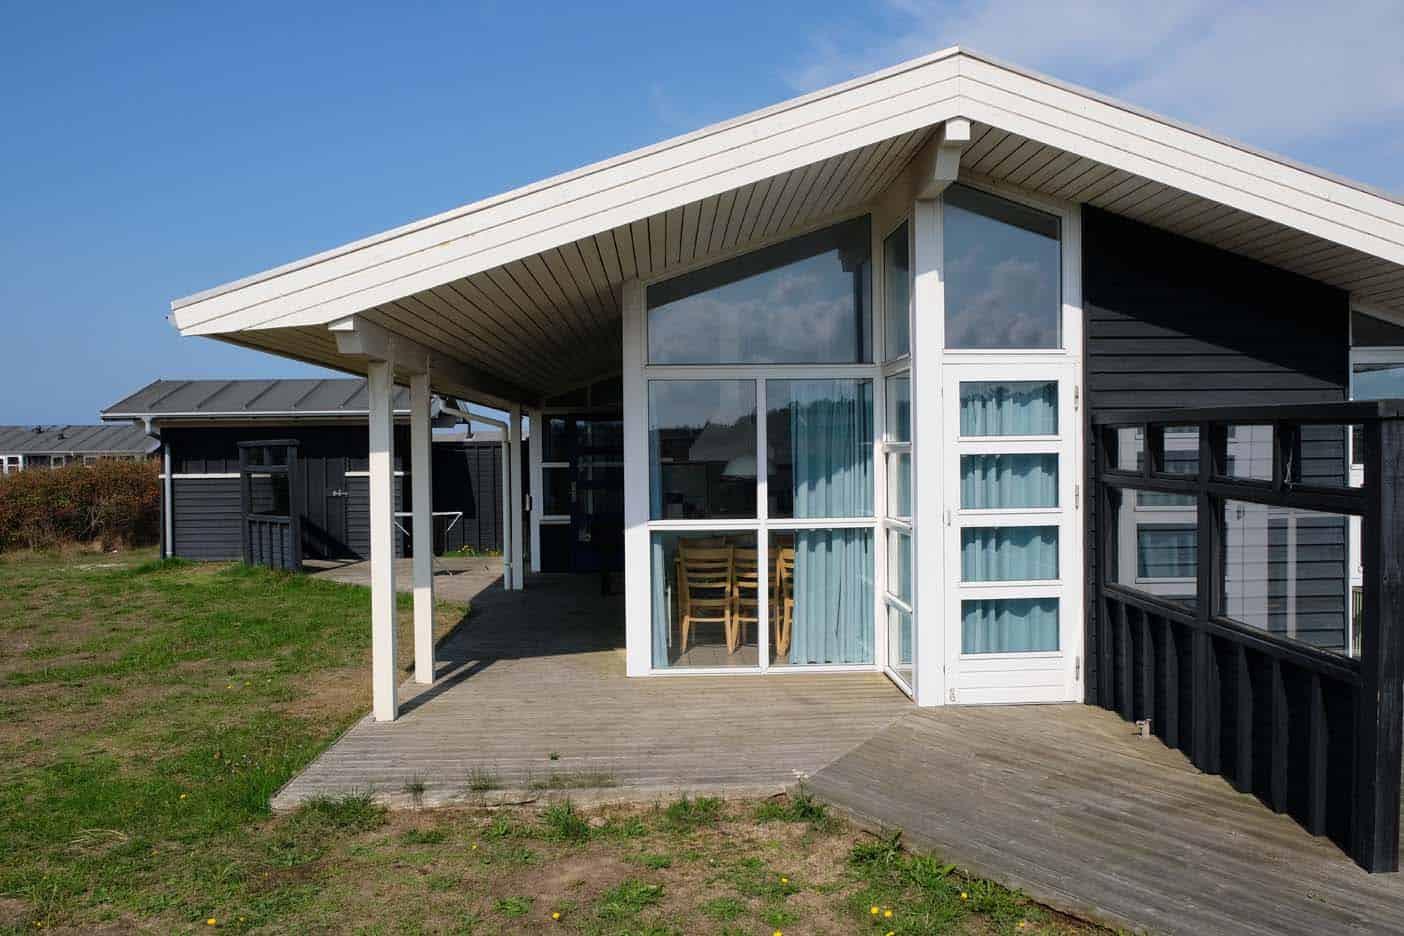 Skallerup seaside resort vakantiewoning